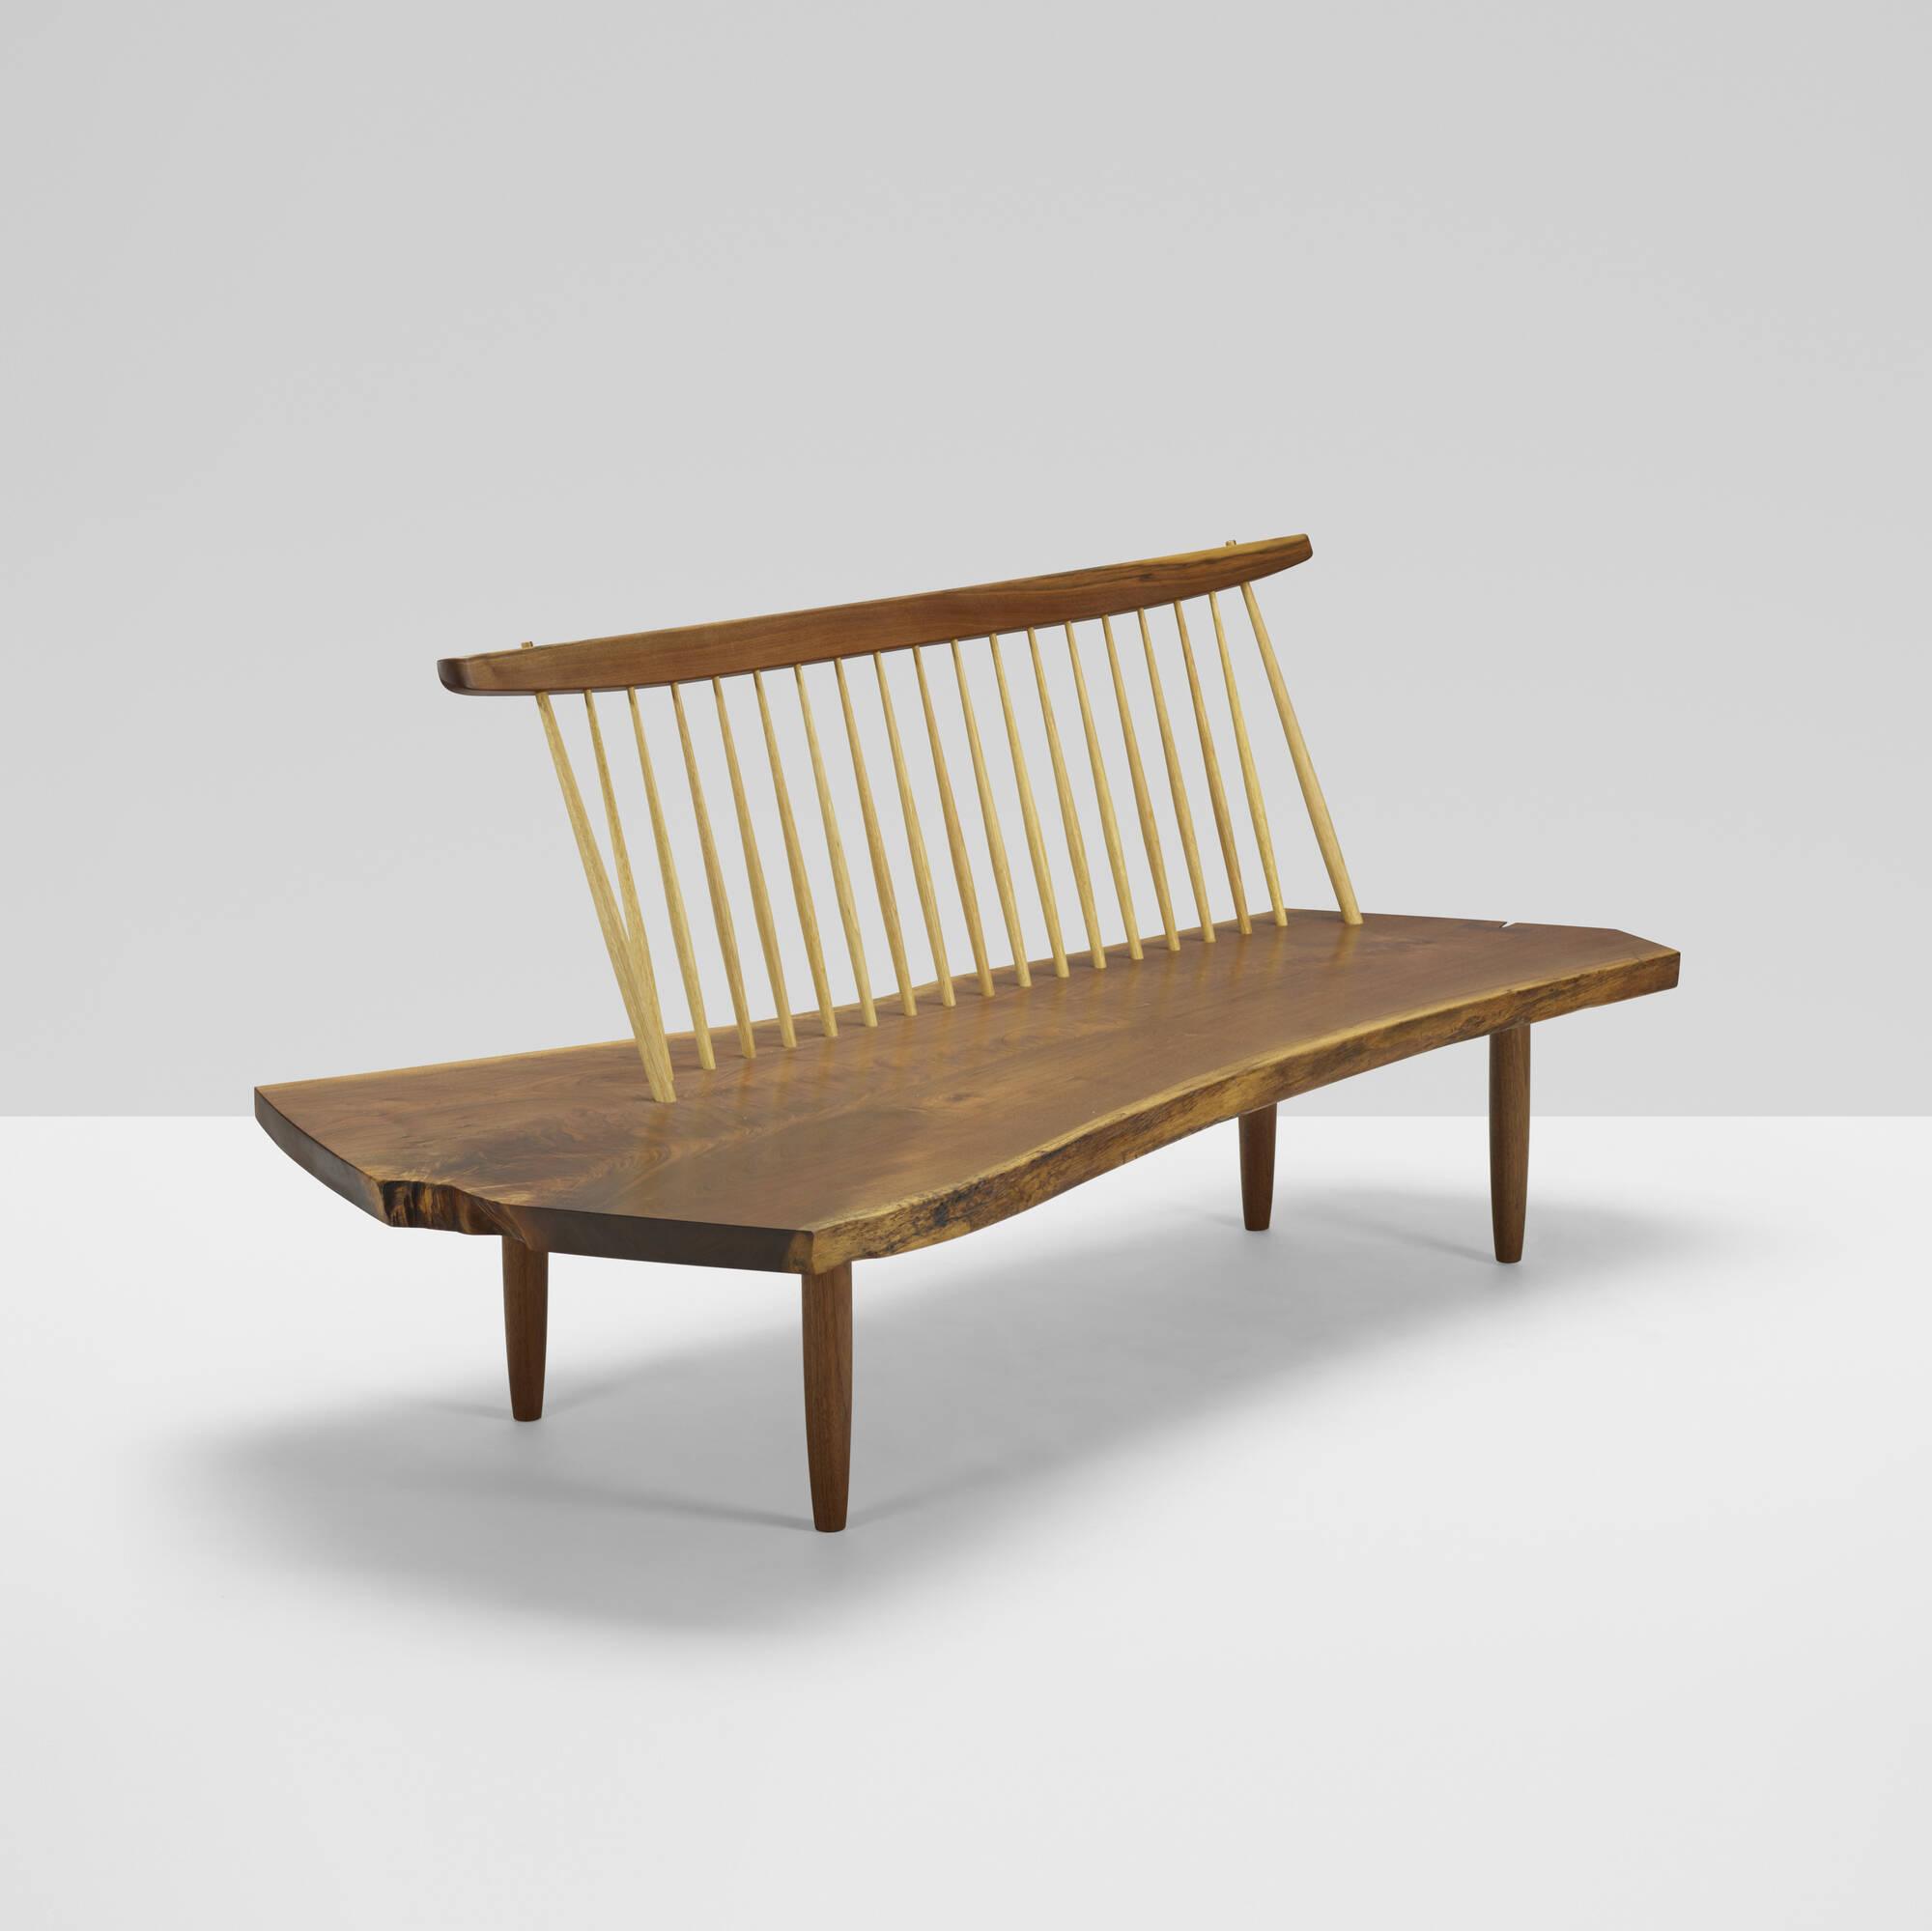 173: Mira Nakashima / Conoid bench (1 of 3)